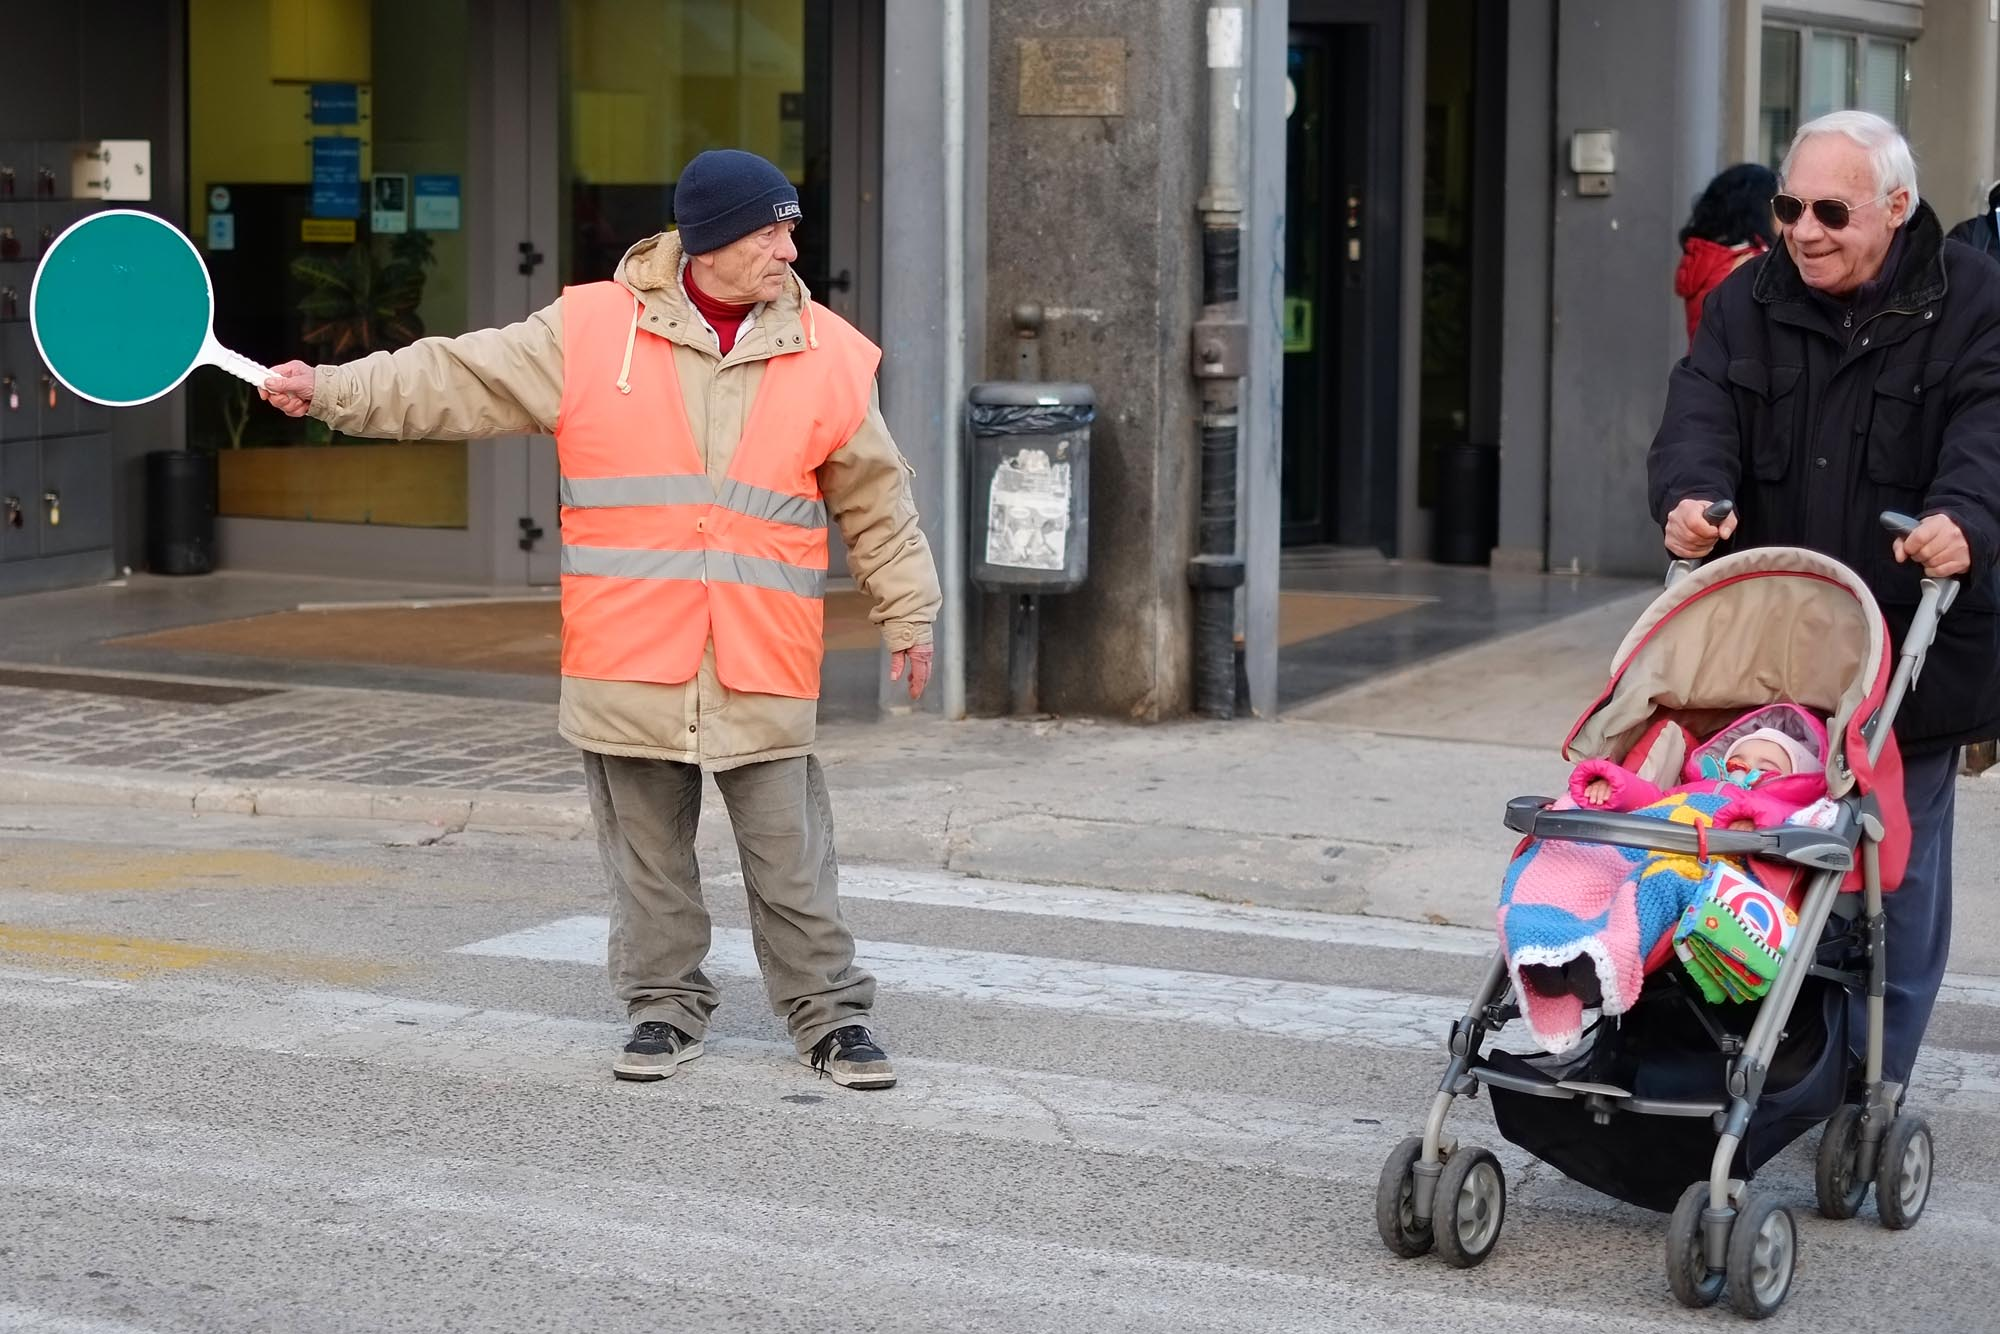 0171 Anziani volontari - Auser, anziani volontari